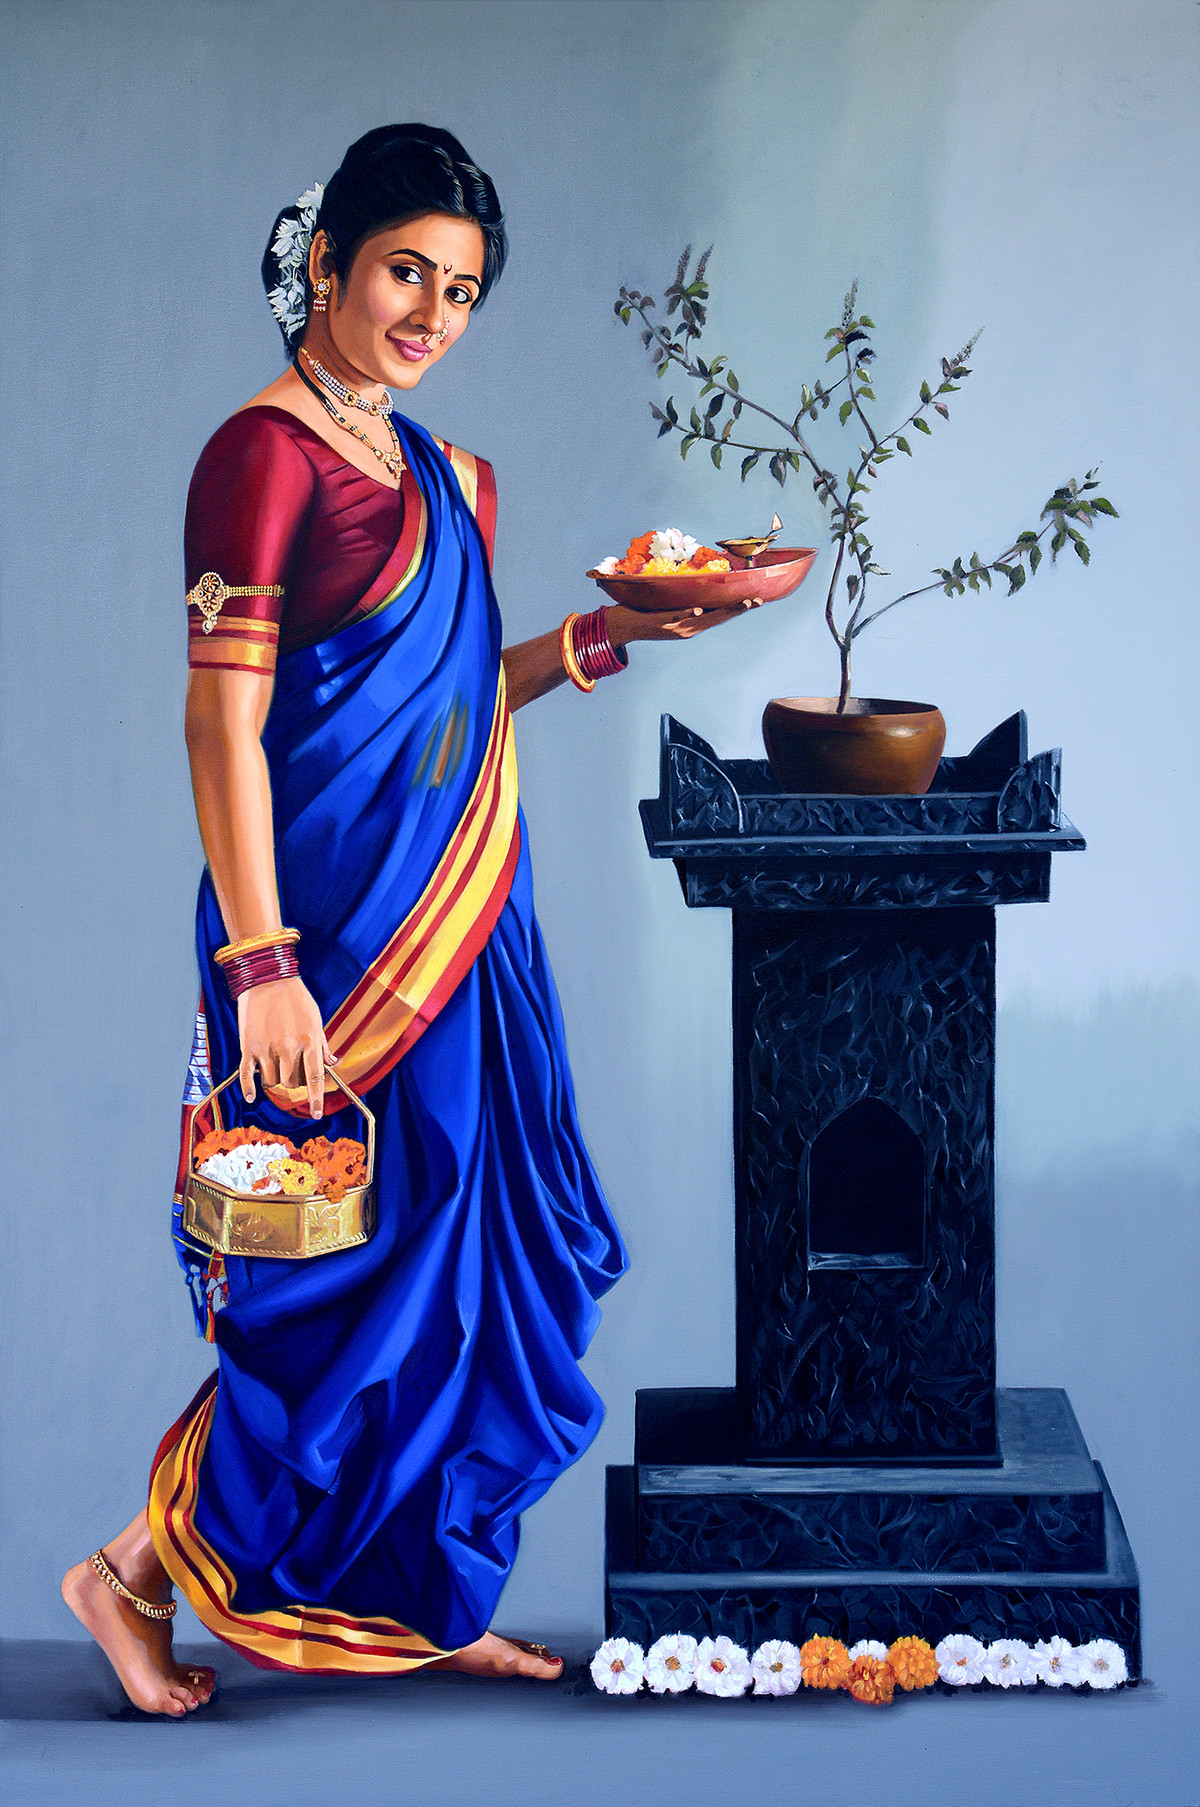 Vishnupriya by VINAYAK TAKALKAR, Photorealism Painting, Oil on Canvas, Nepal color